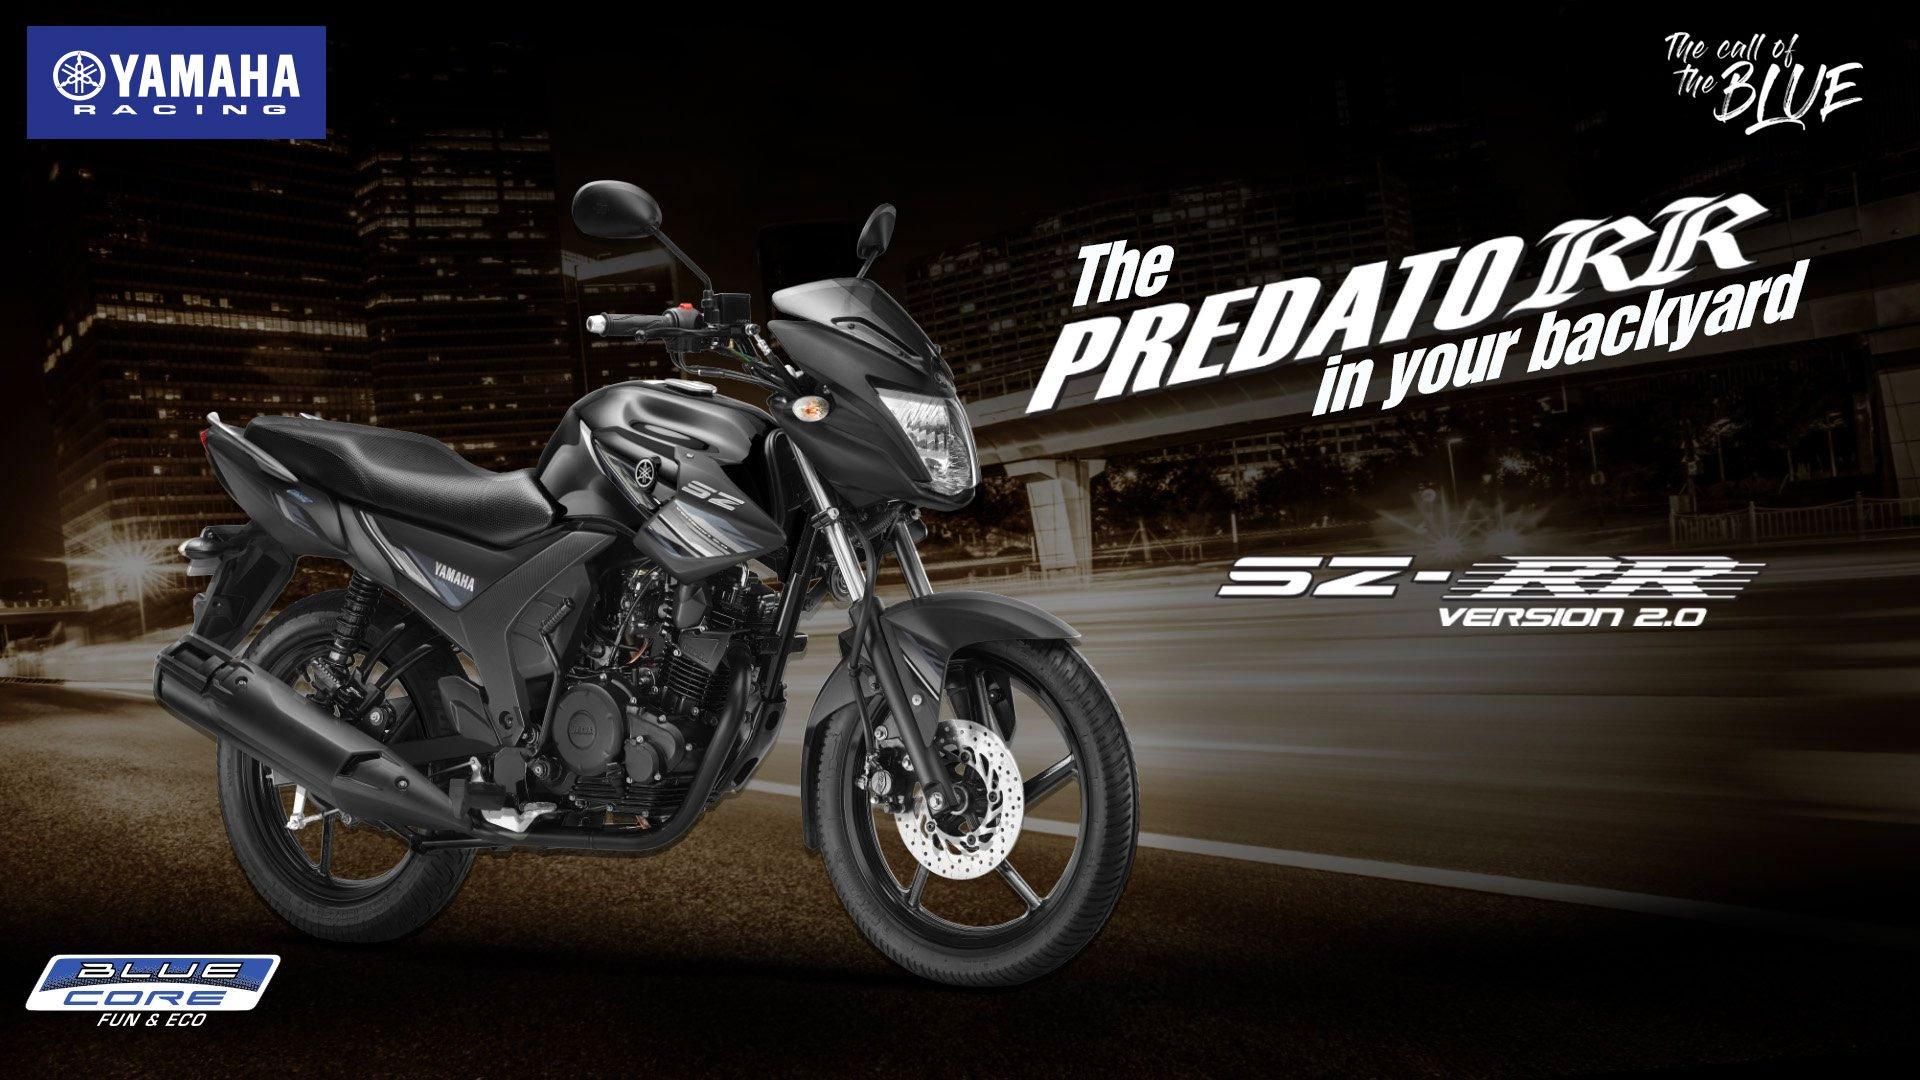 Yamaha SZ RR Bluecore Price, Model, Mileage, Specs, Images ... on